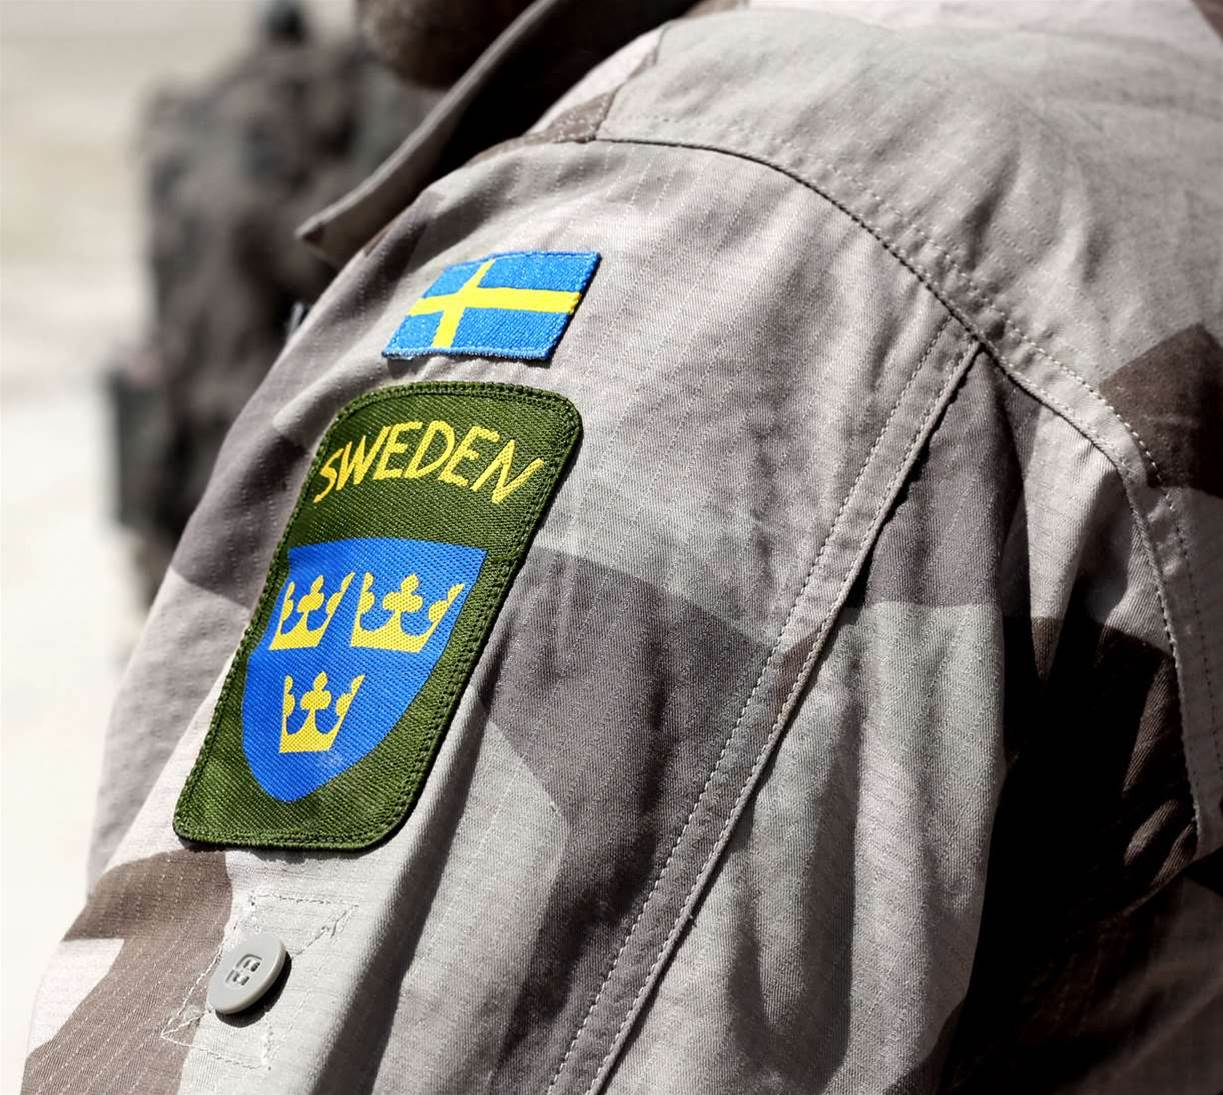 Sweden pulls 700 MHz auction over security concerns